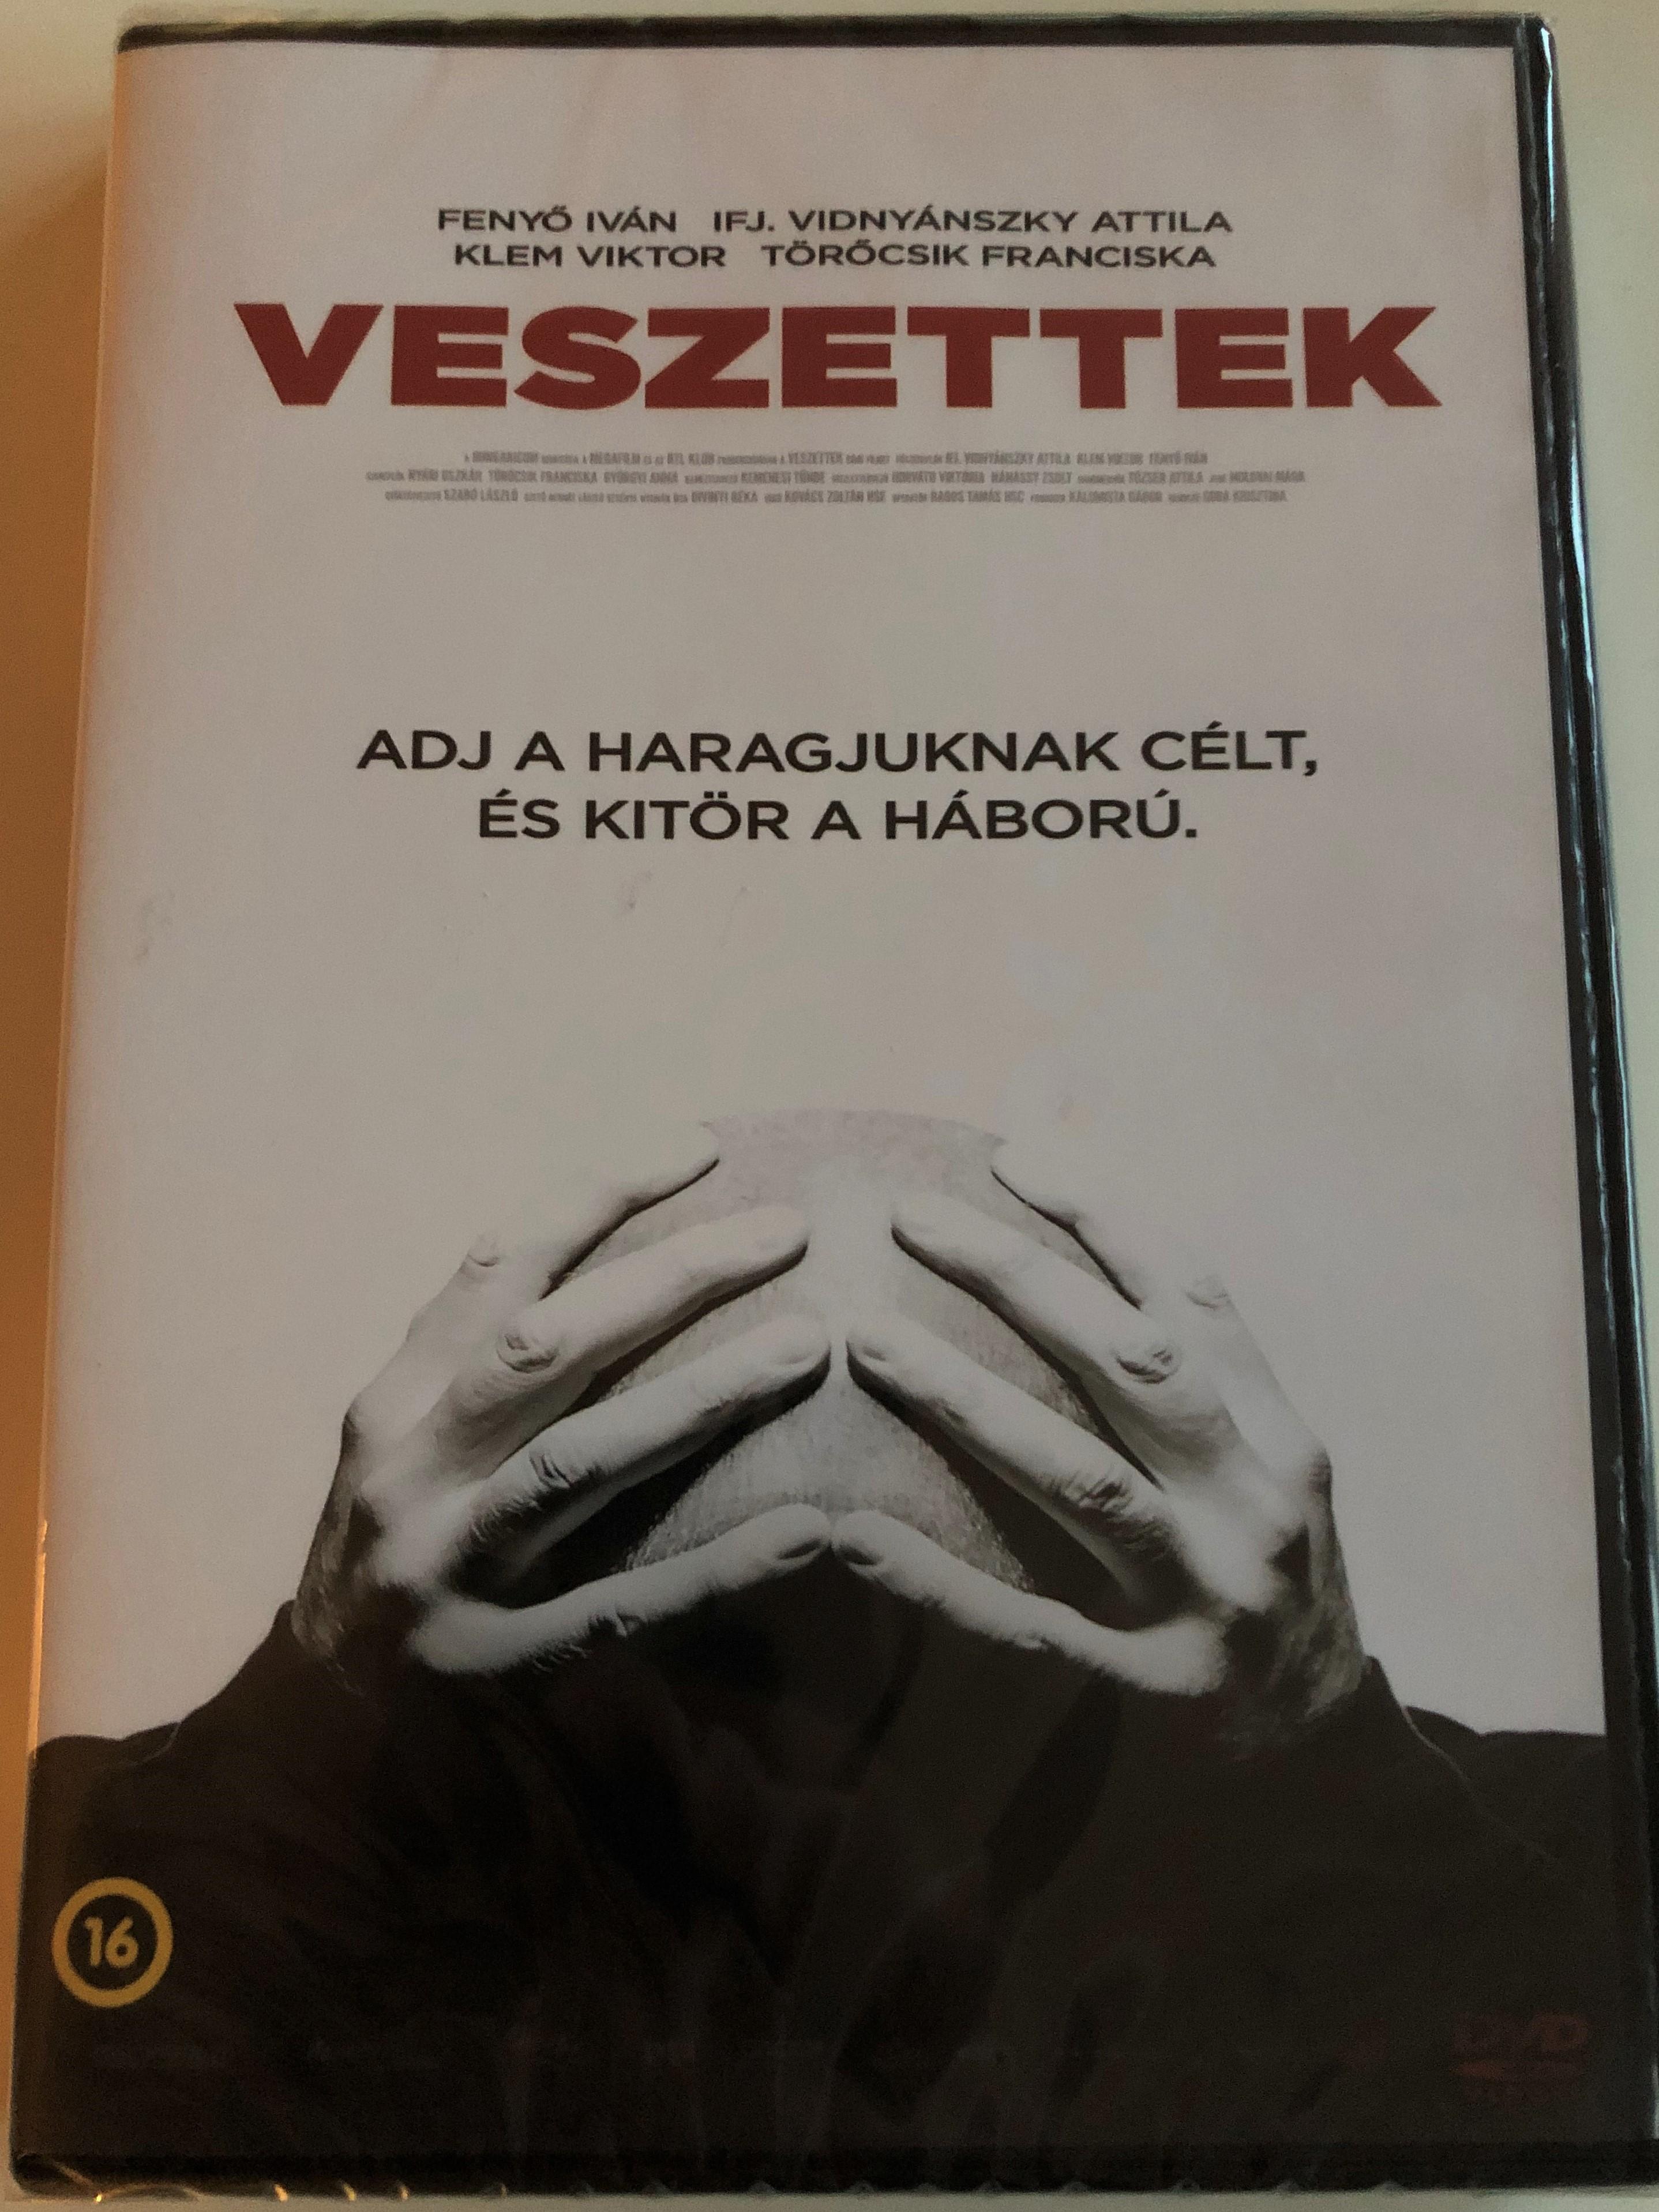 veszettek-dvd-2015-home-guards-directed-by-krisztina-goda-1.jpg